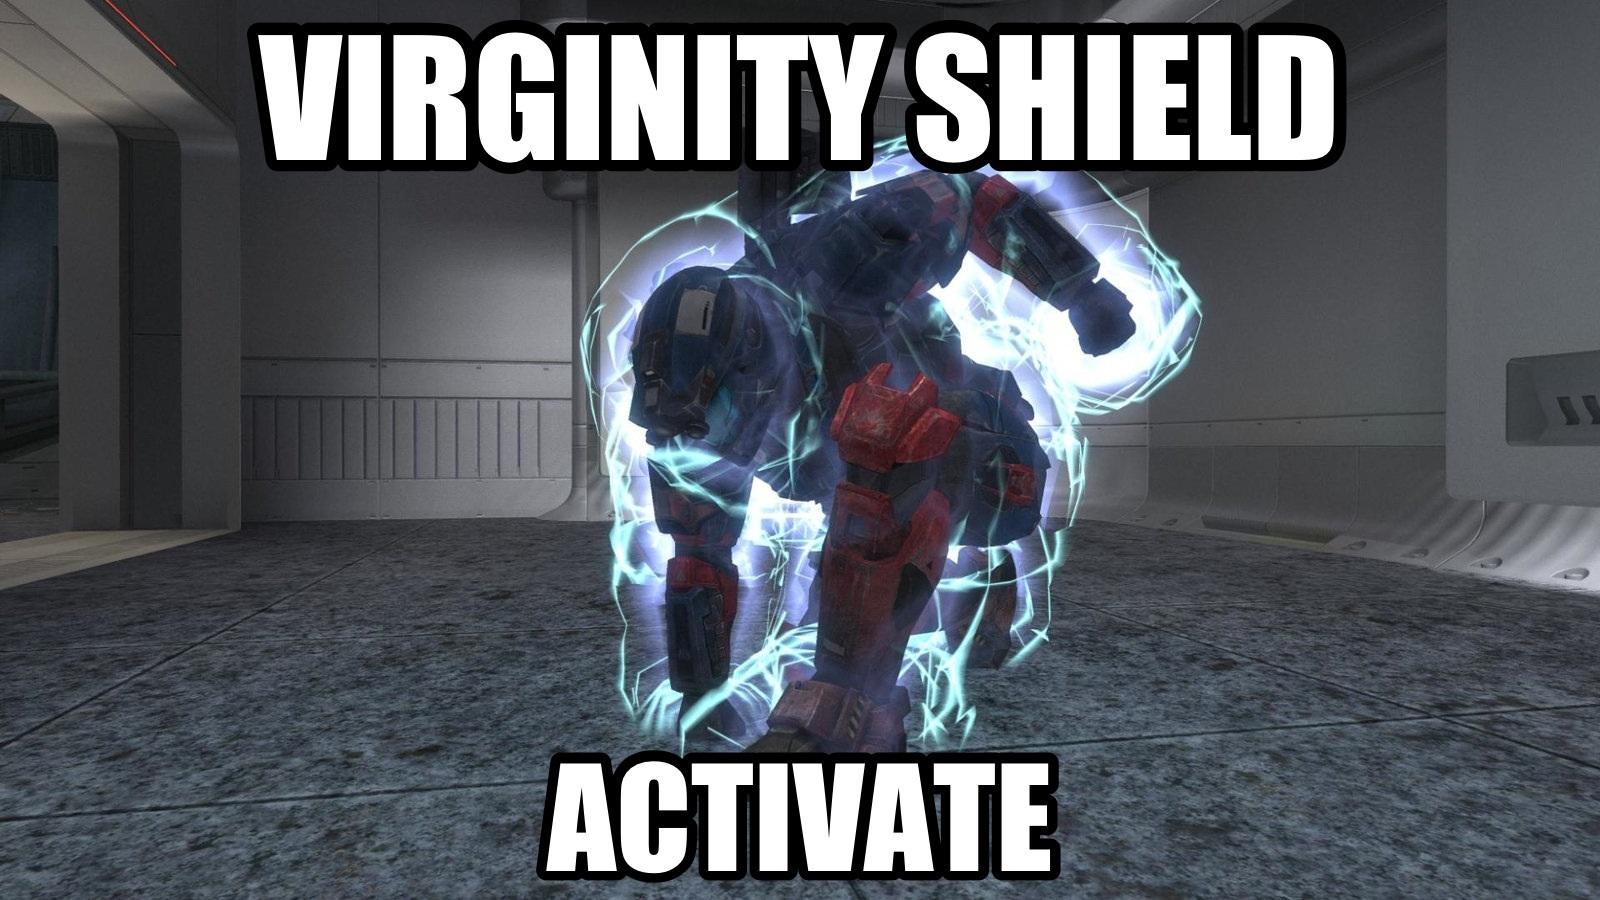 f84 halo reach virginity meme virgins know your meme